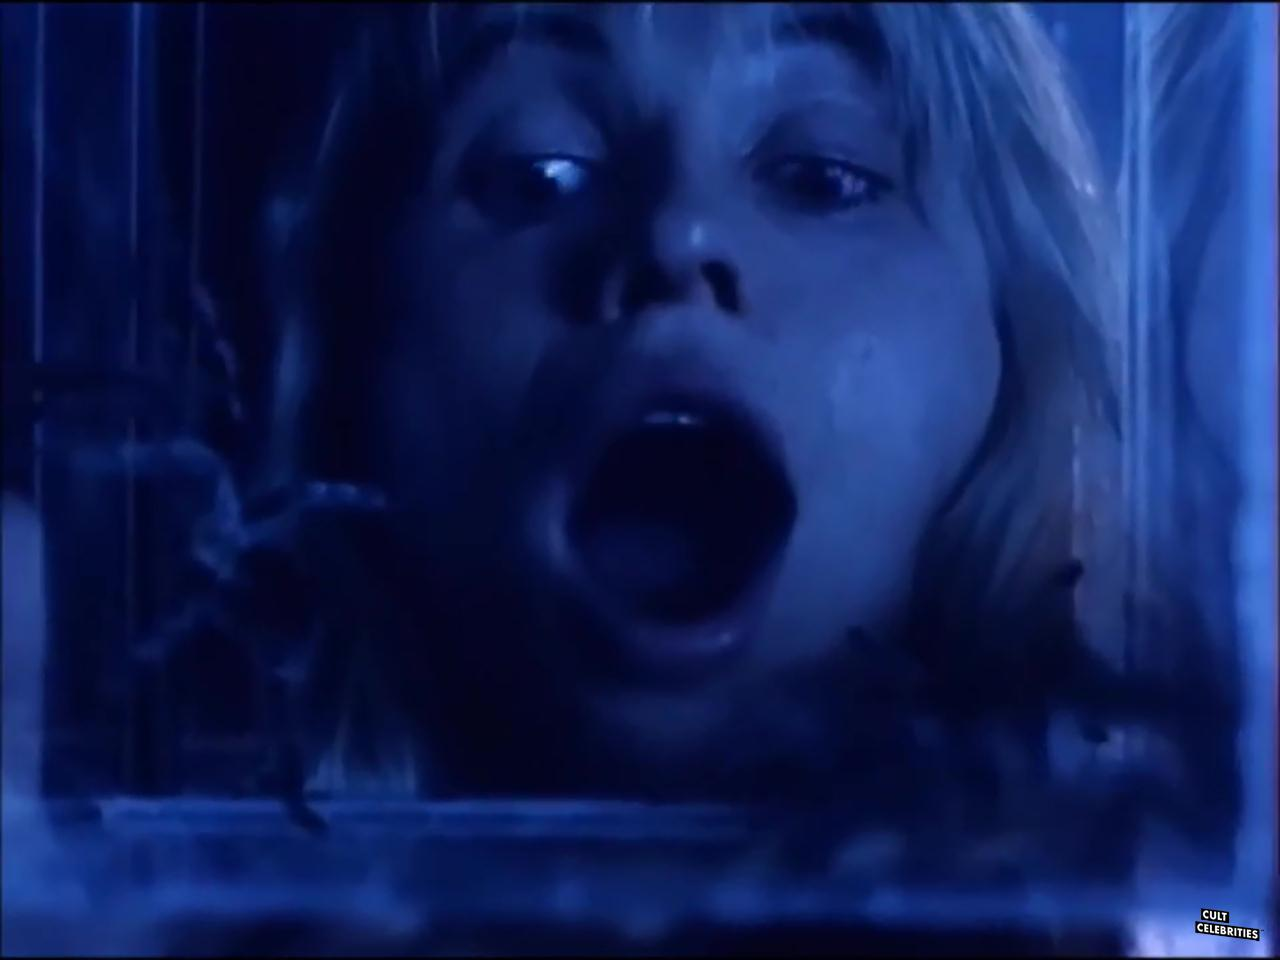 Elizabeth Kaitan in Nightwish (1989)